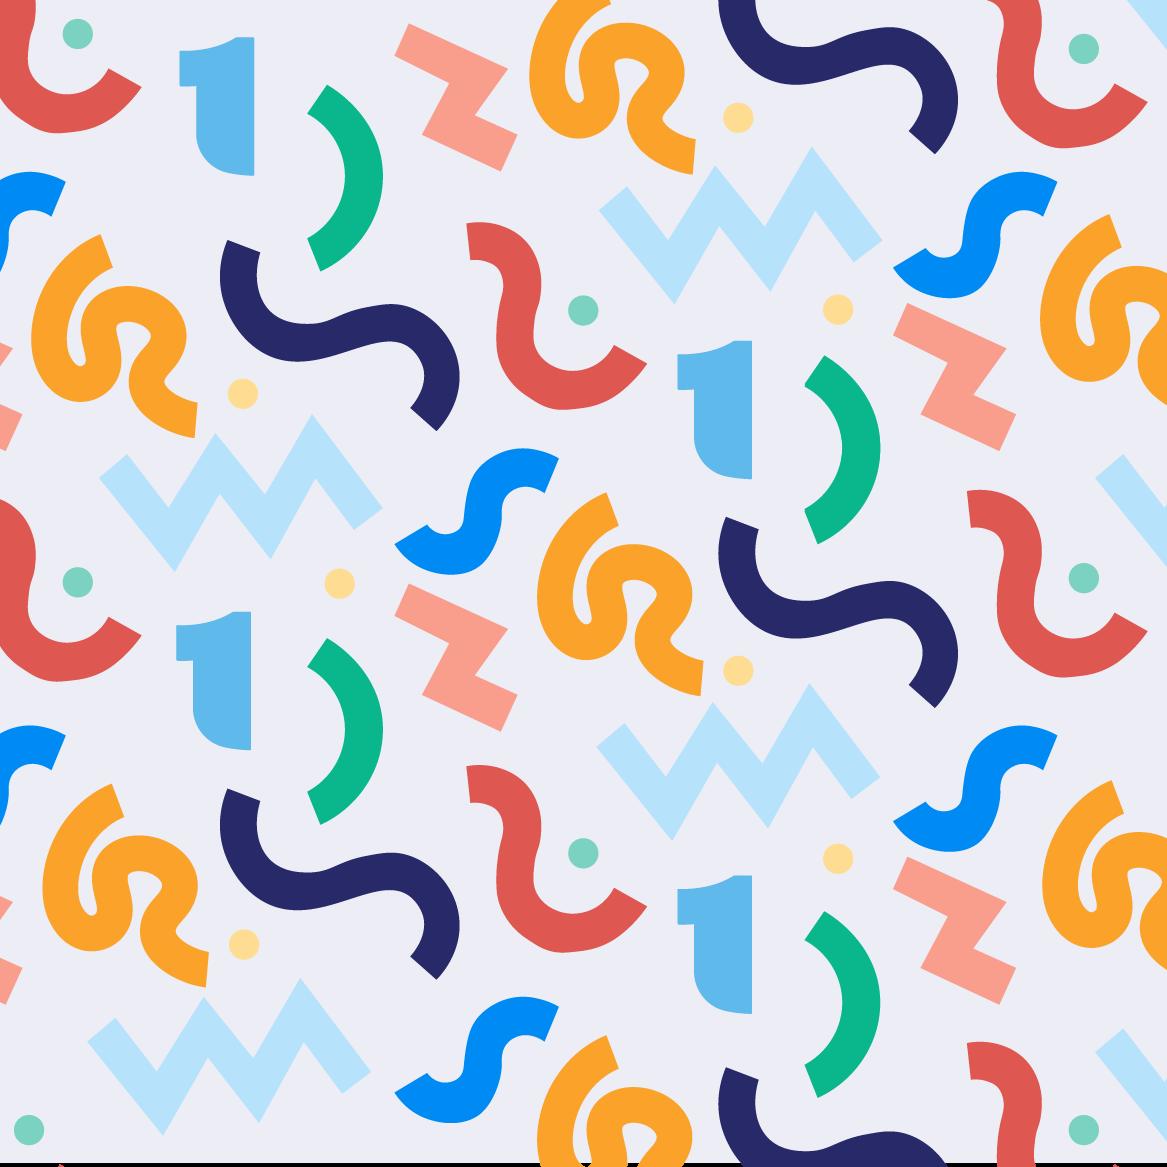 N1-decorative-pattern-01